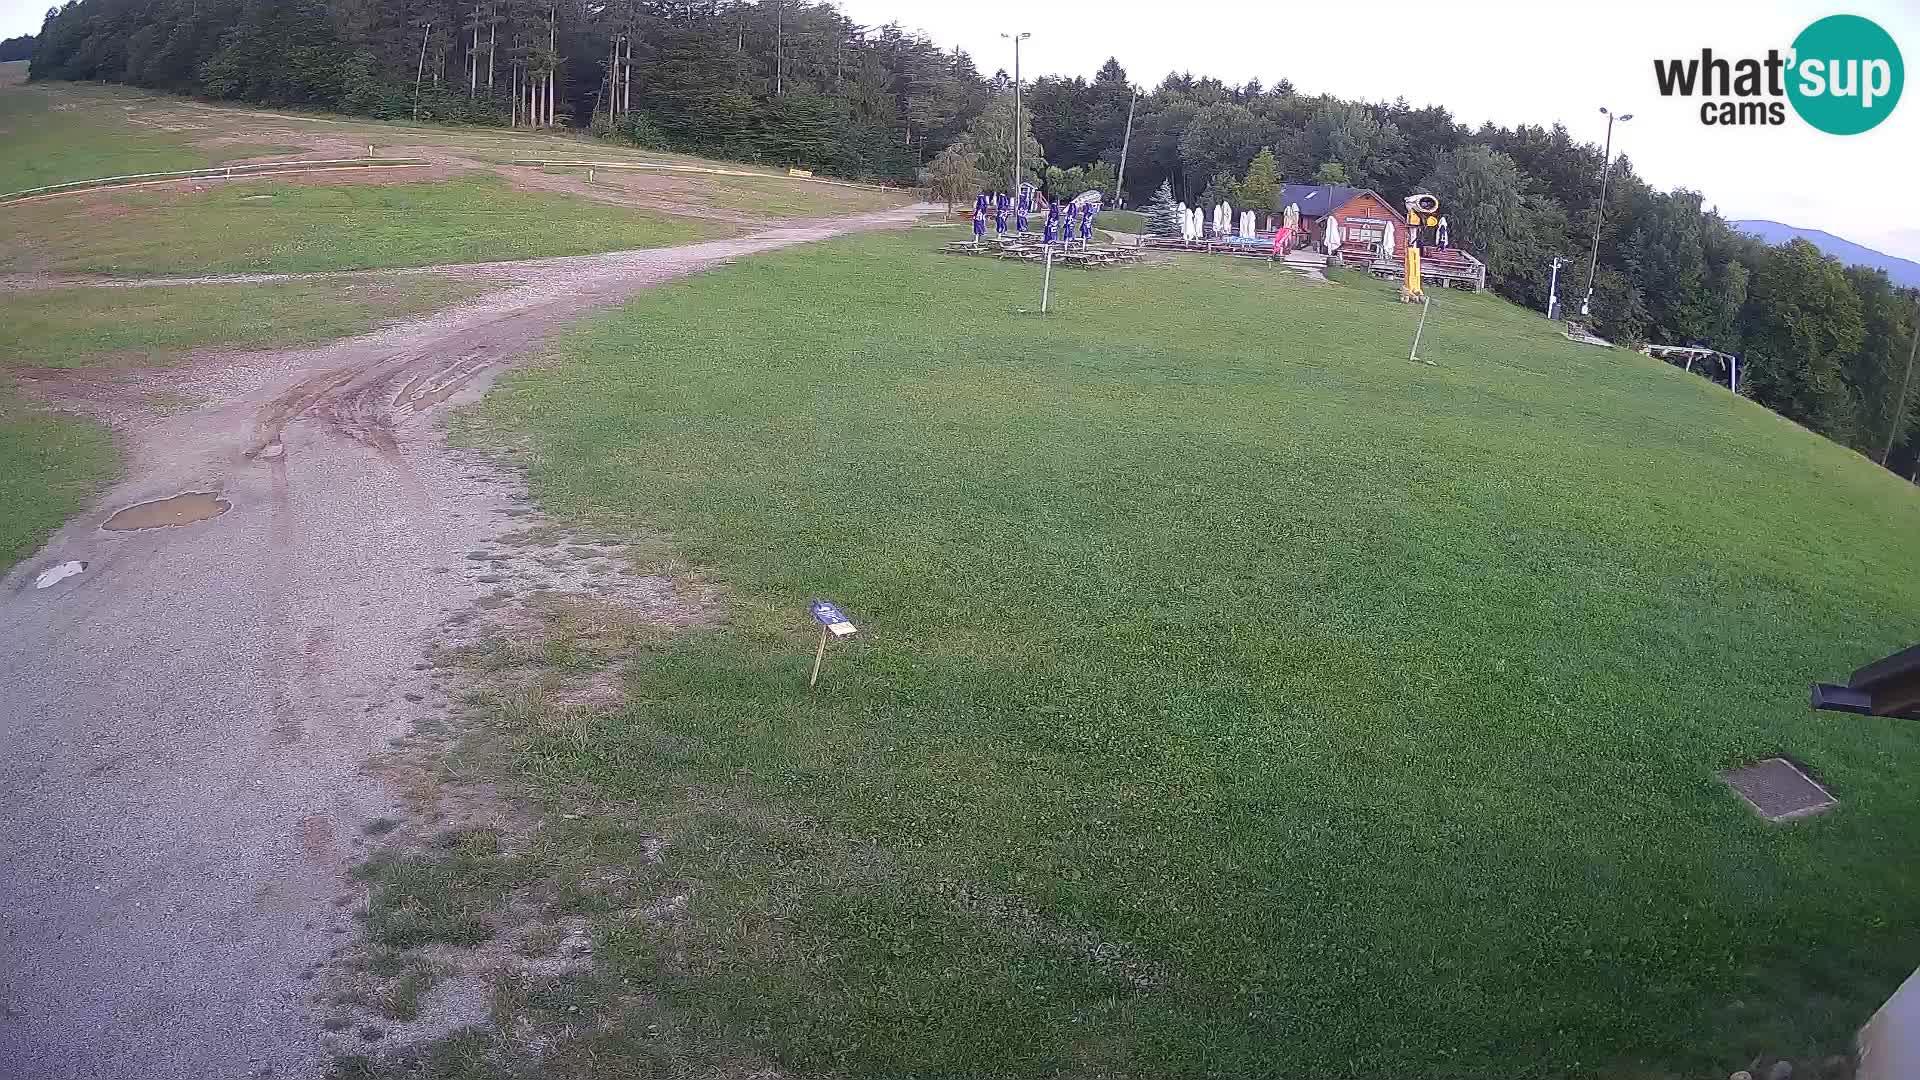 Stazione sciistica Maribor Pohorje – Trikotna Jasa